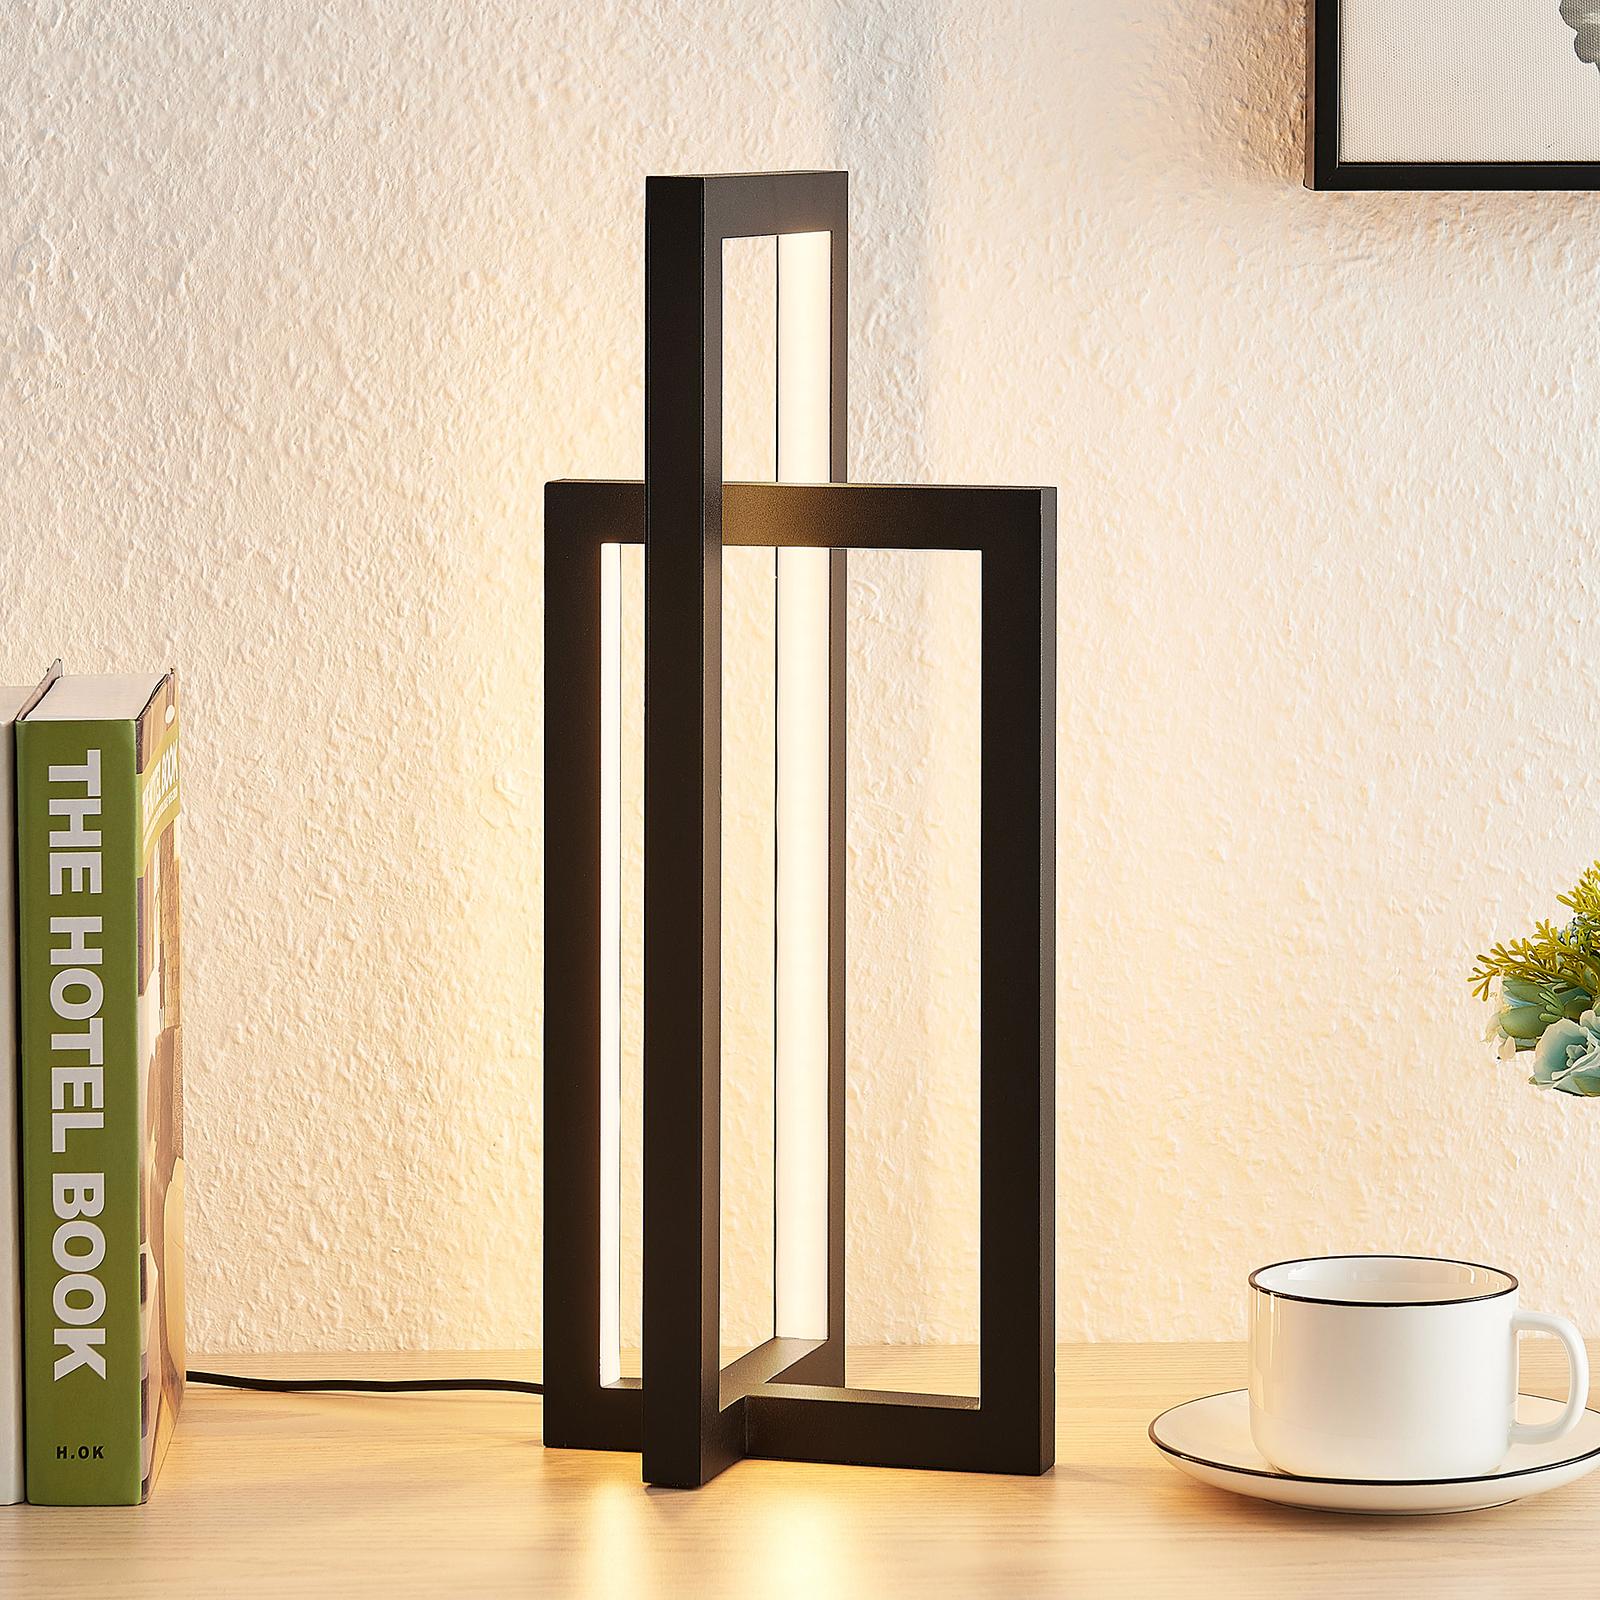 Lucande Hylda LED tafellamp in zwart